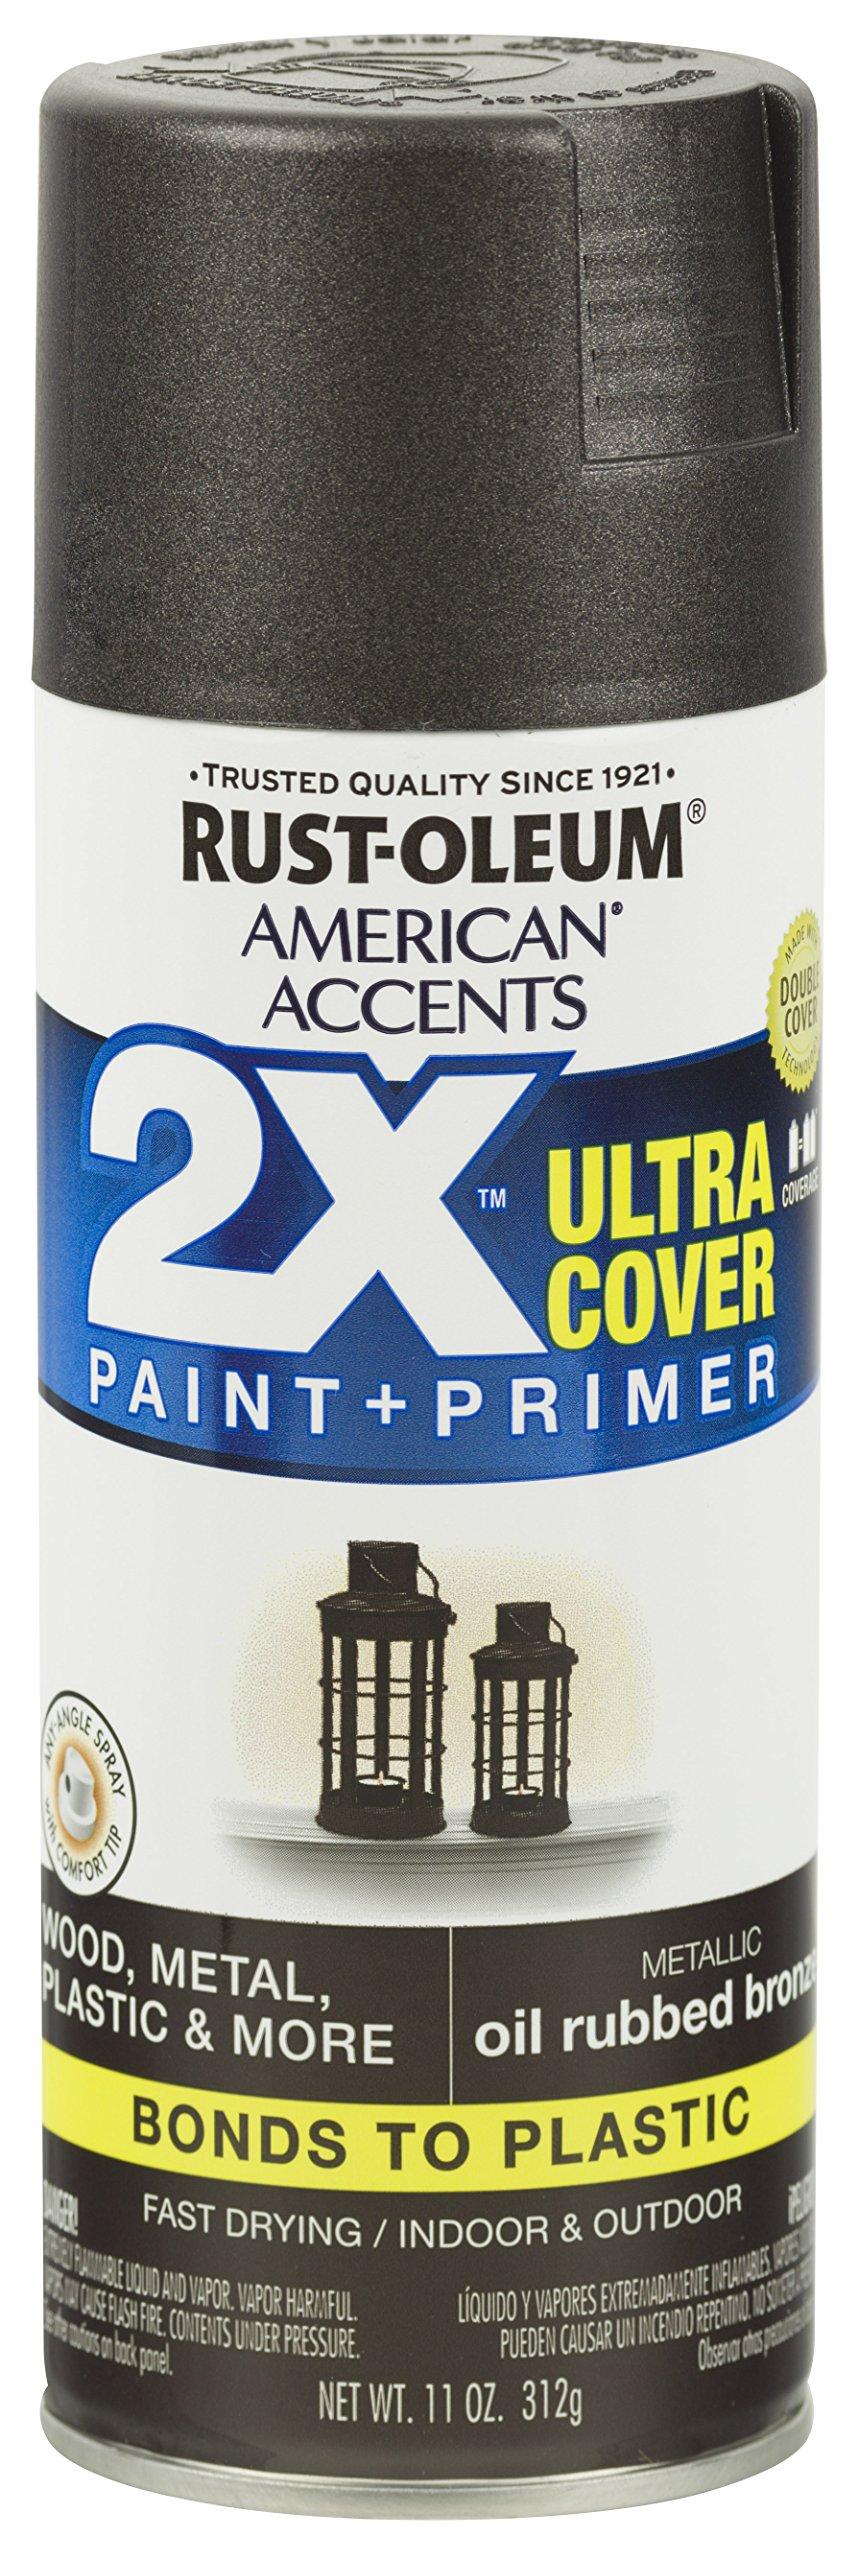 Rust-Oleum 327906-6PK American Accents Ultra Cover 2x Metallic, Metallic Oil Rubbed Bronze